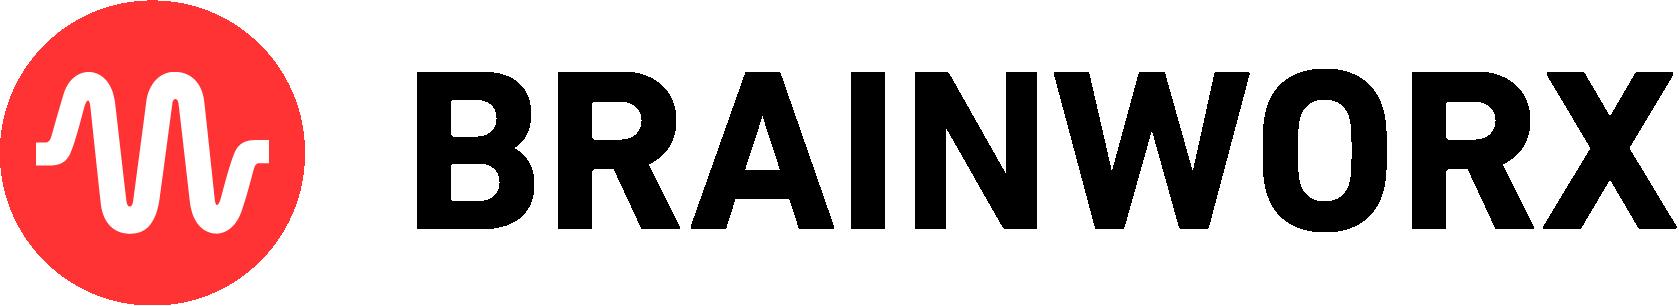 BX_Logo_GUI_PNG_RB_01.png